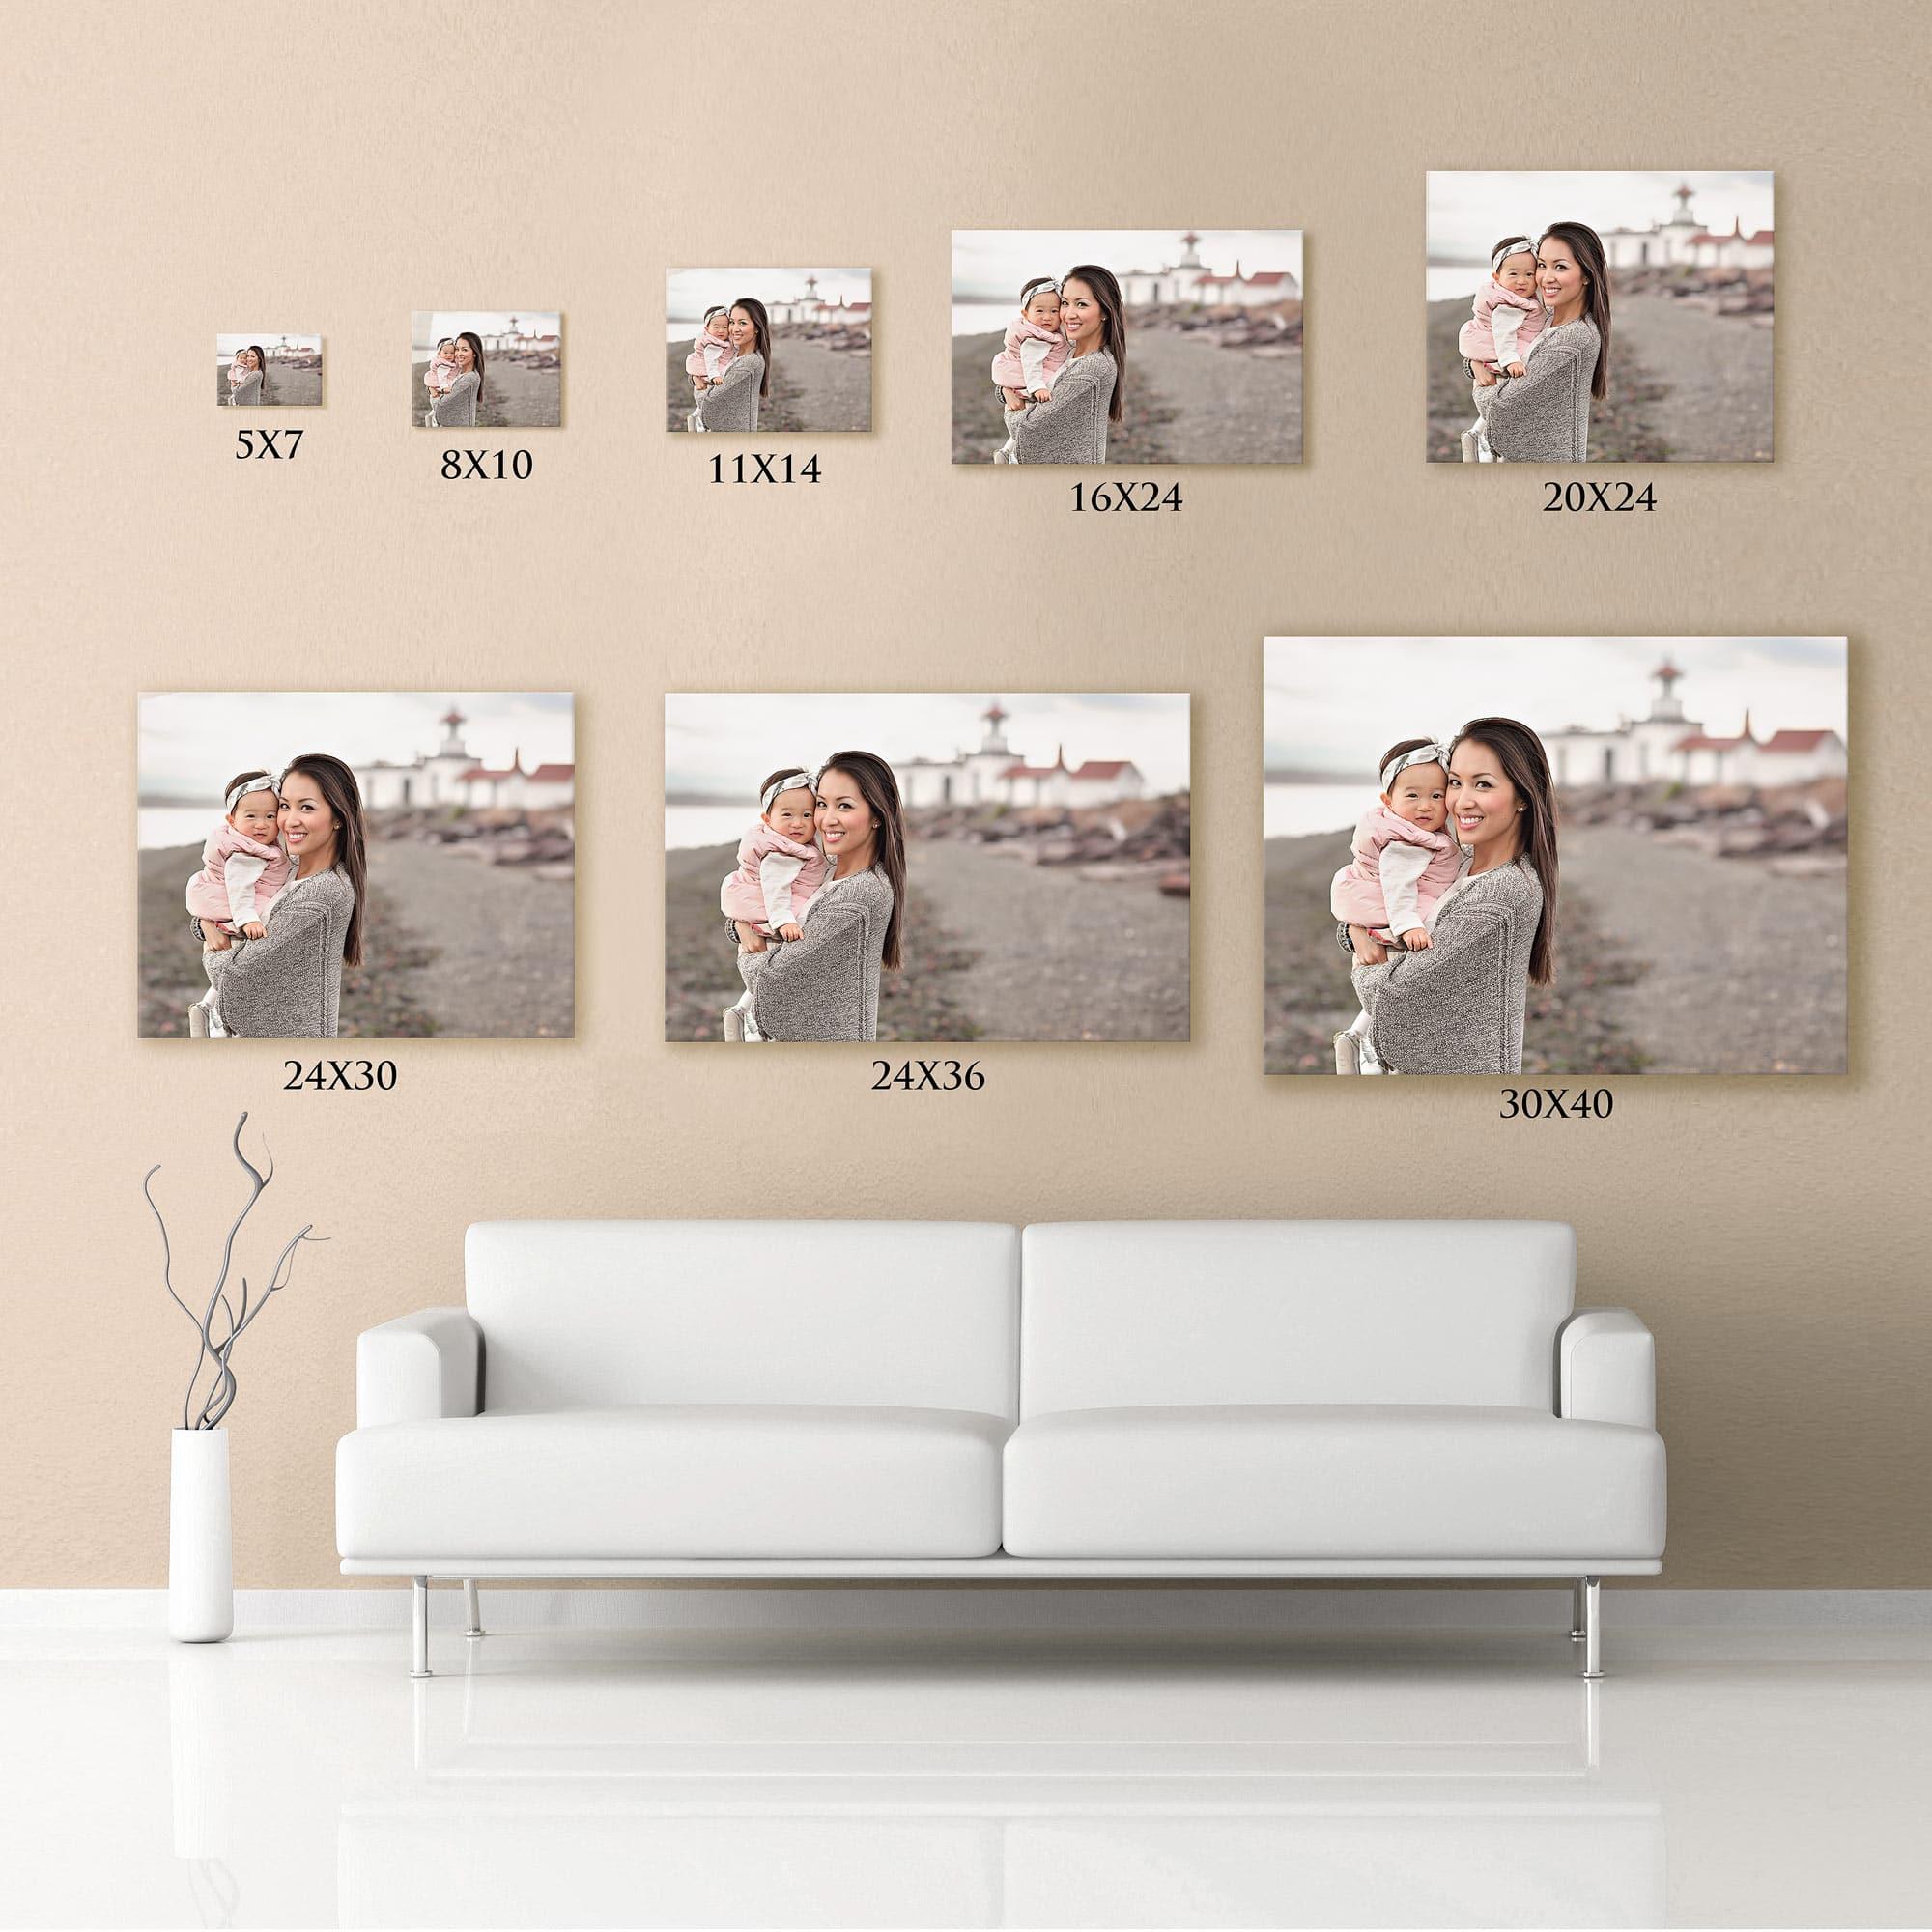 printing and storing digital images